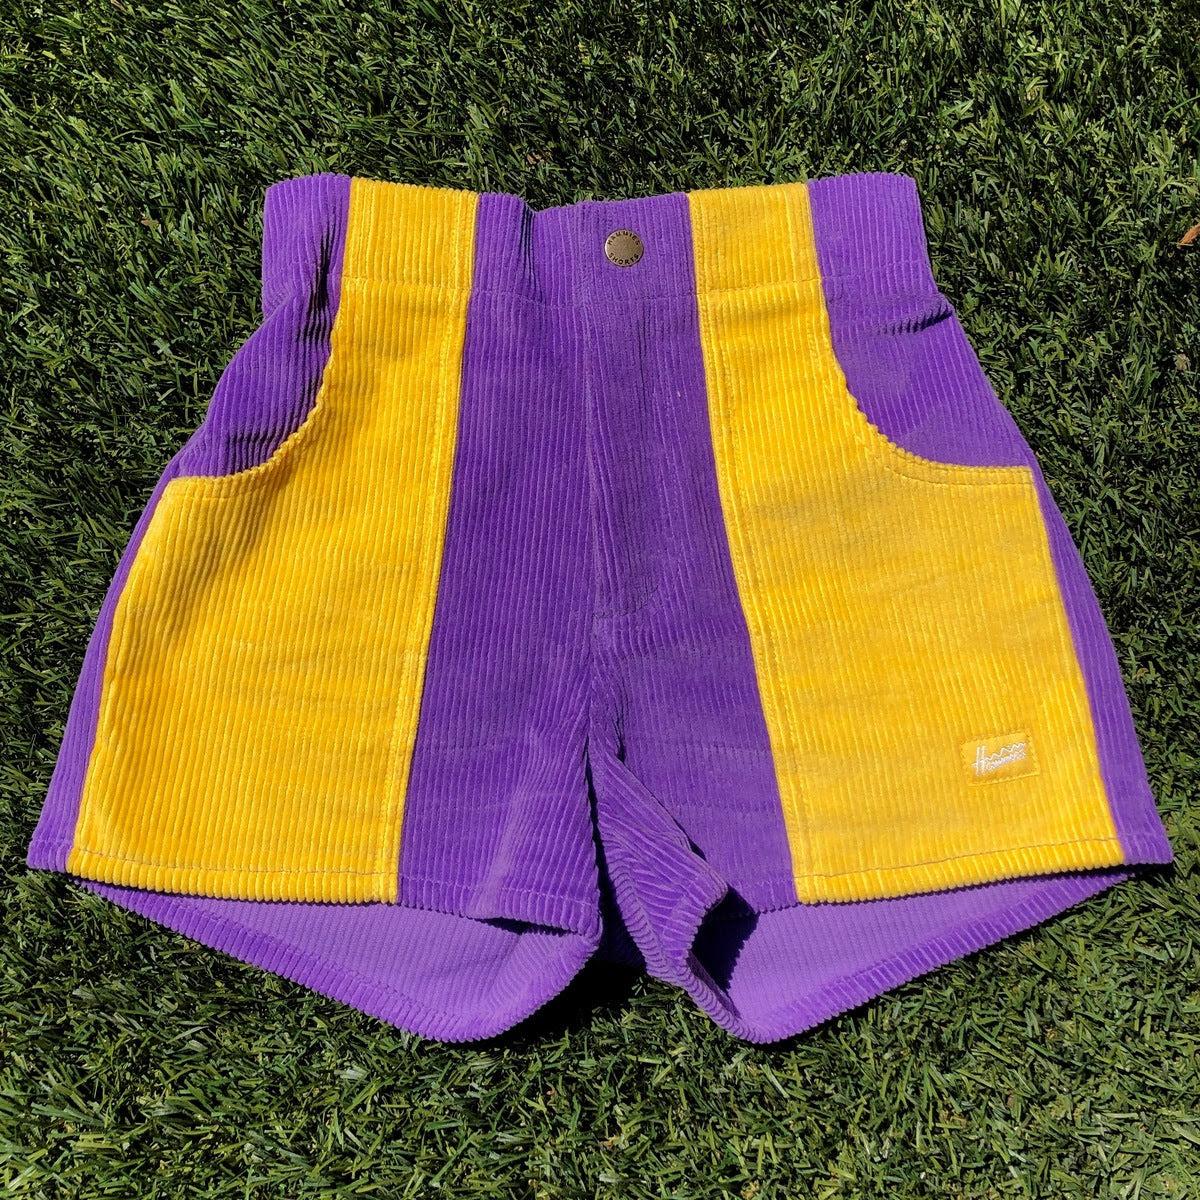 The new Purple/Yellow